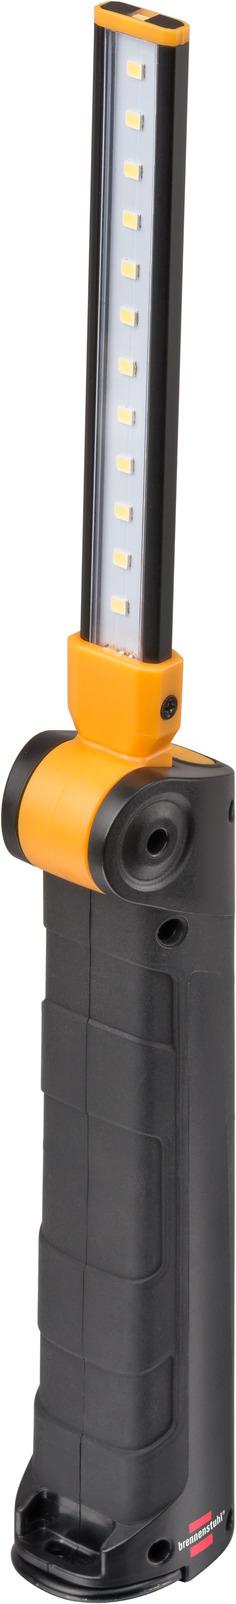 Brennenstuhl Sansa - LED - 13 Glühbirne(n) - 3,3 W - 6000 K - 400 lm - Schwarz - Gelb